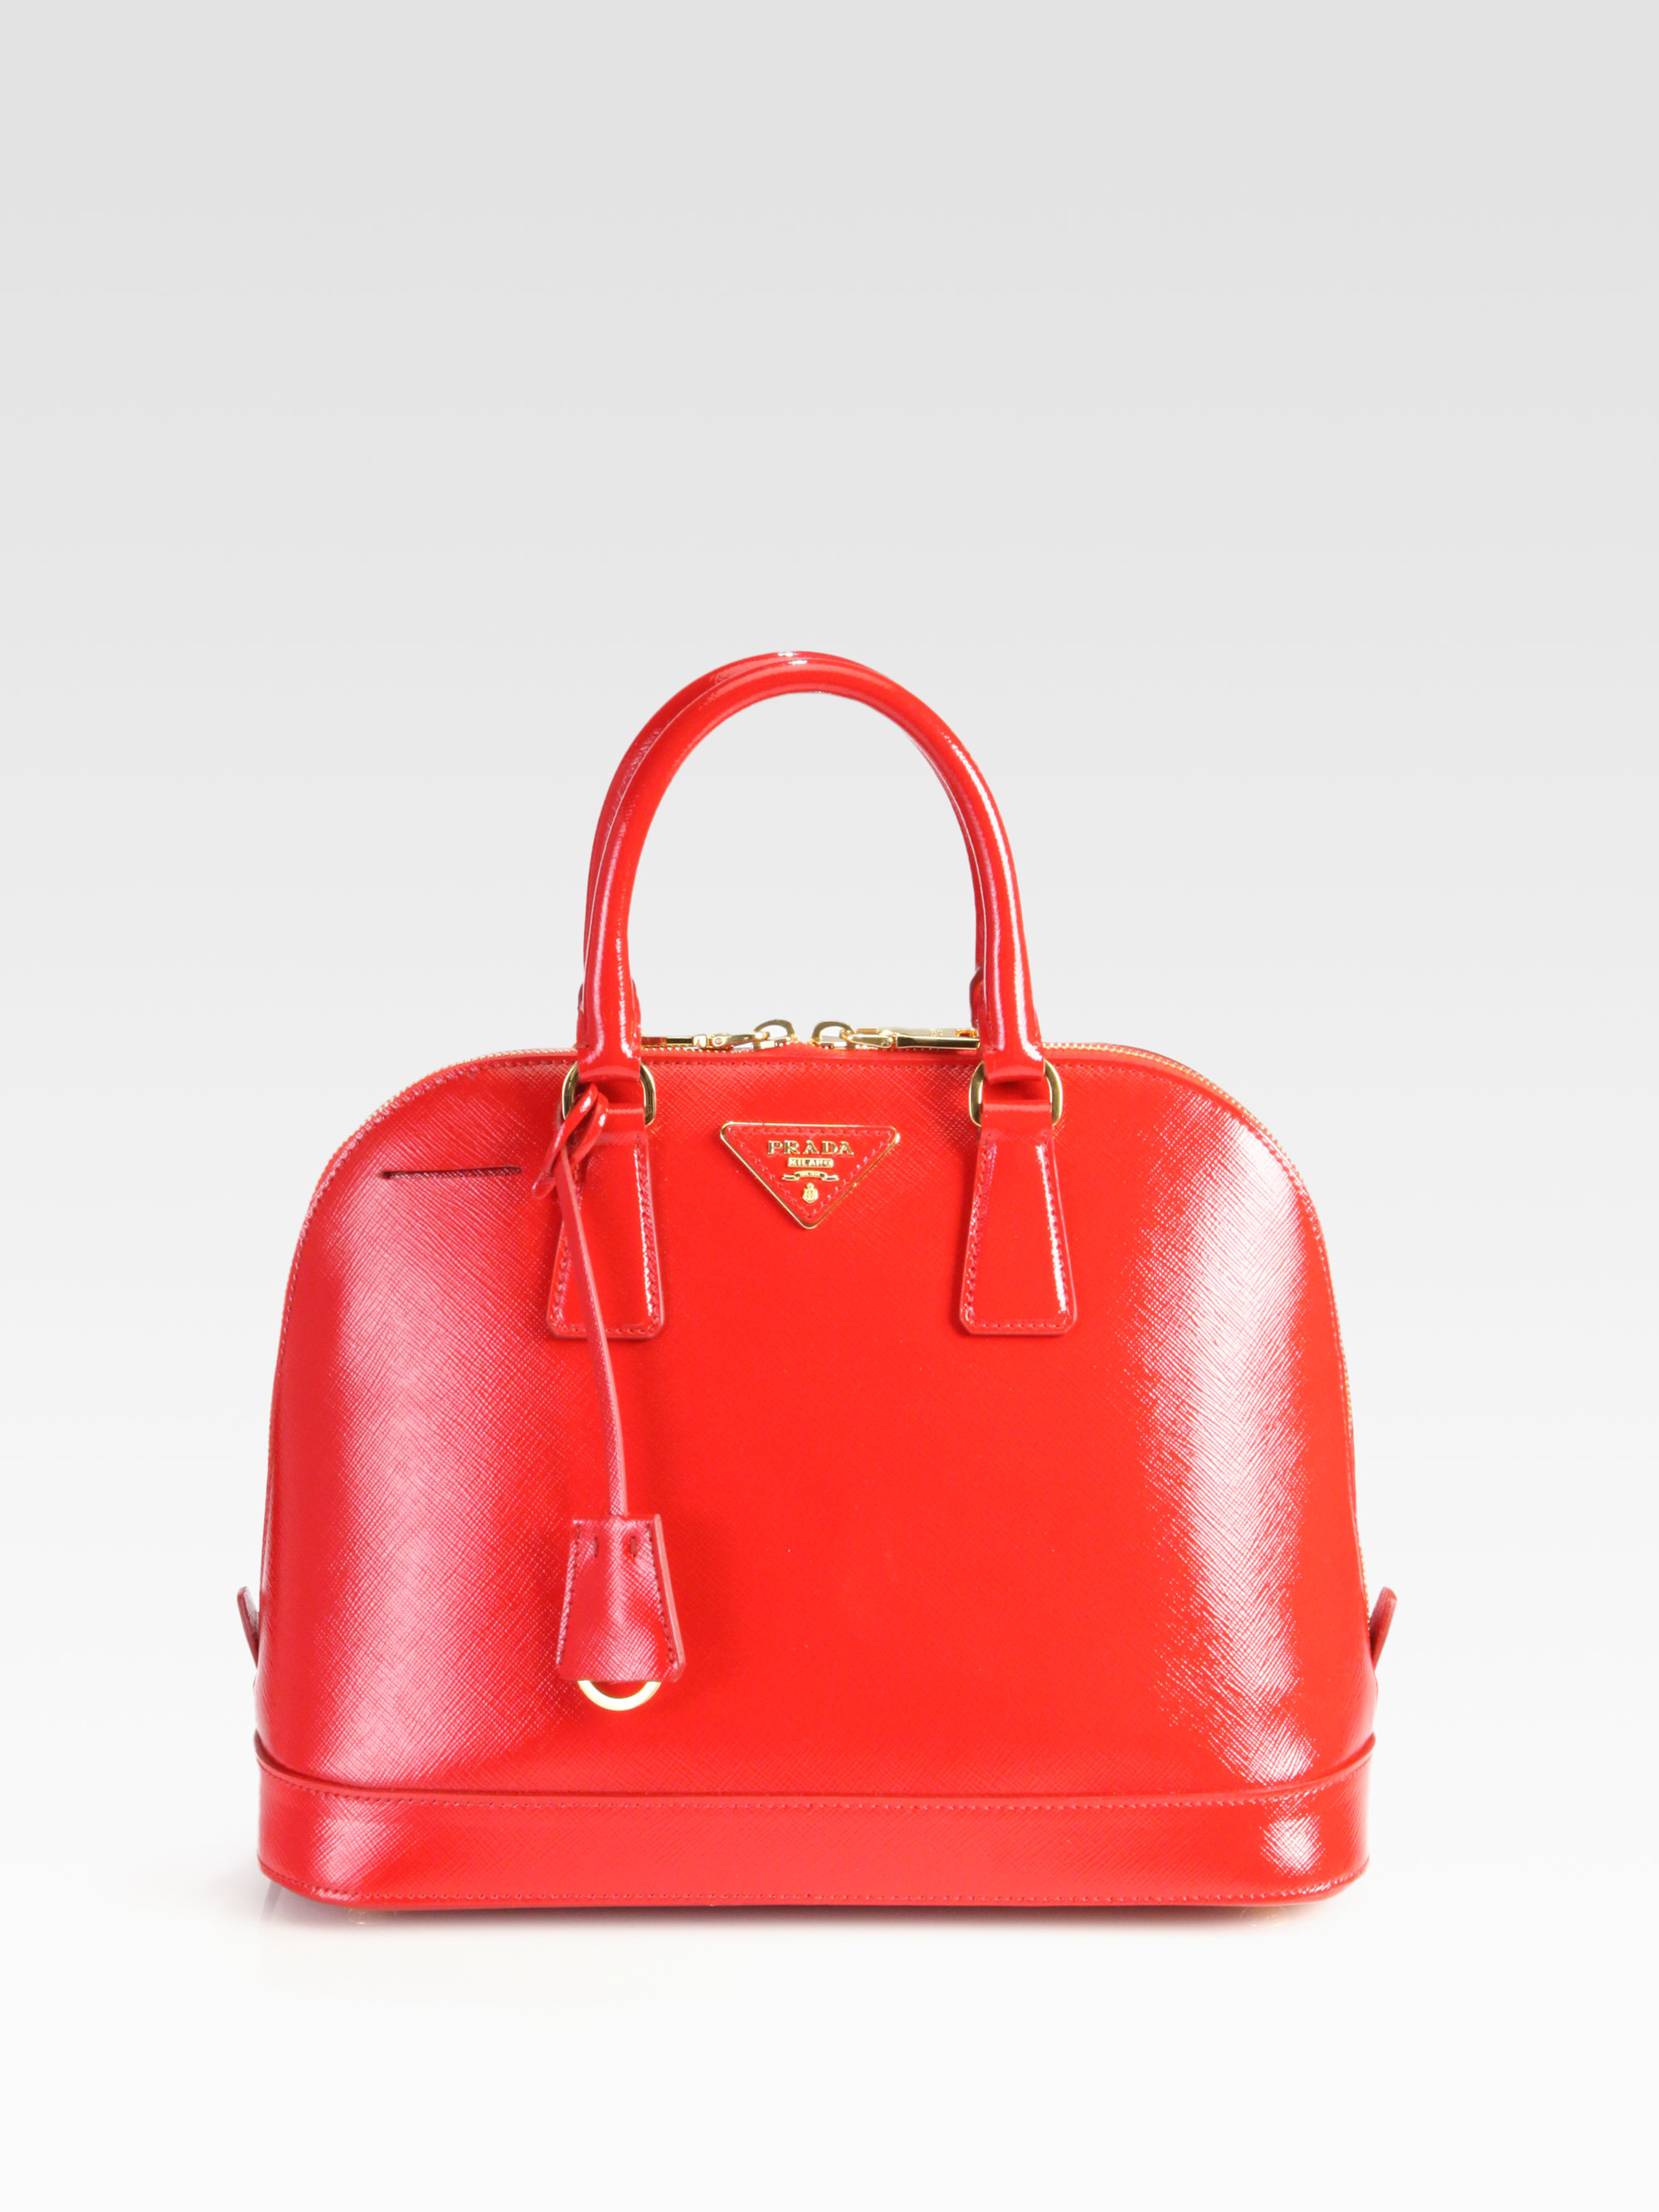 91fd85f95 ... where to buy lyst prada saffiano vernice bugatti top handle bag in red  87bde 91d3f